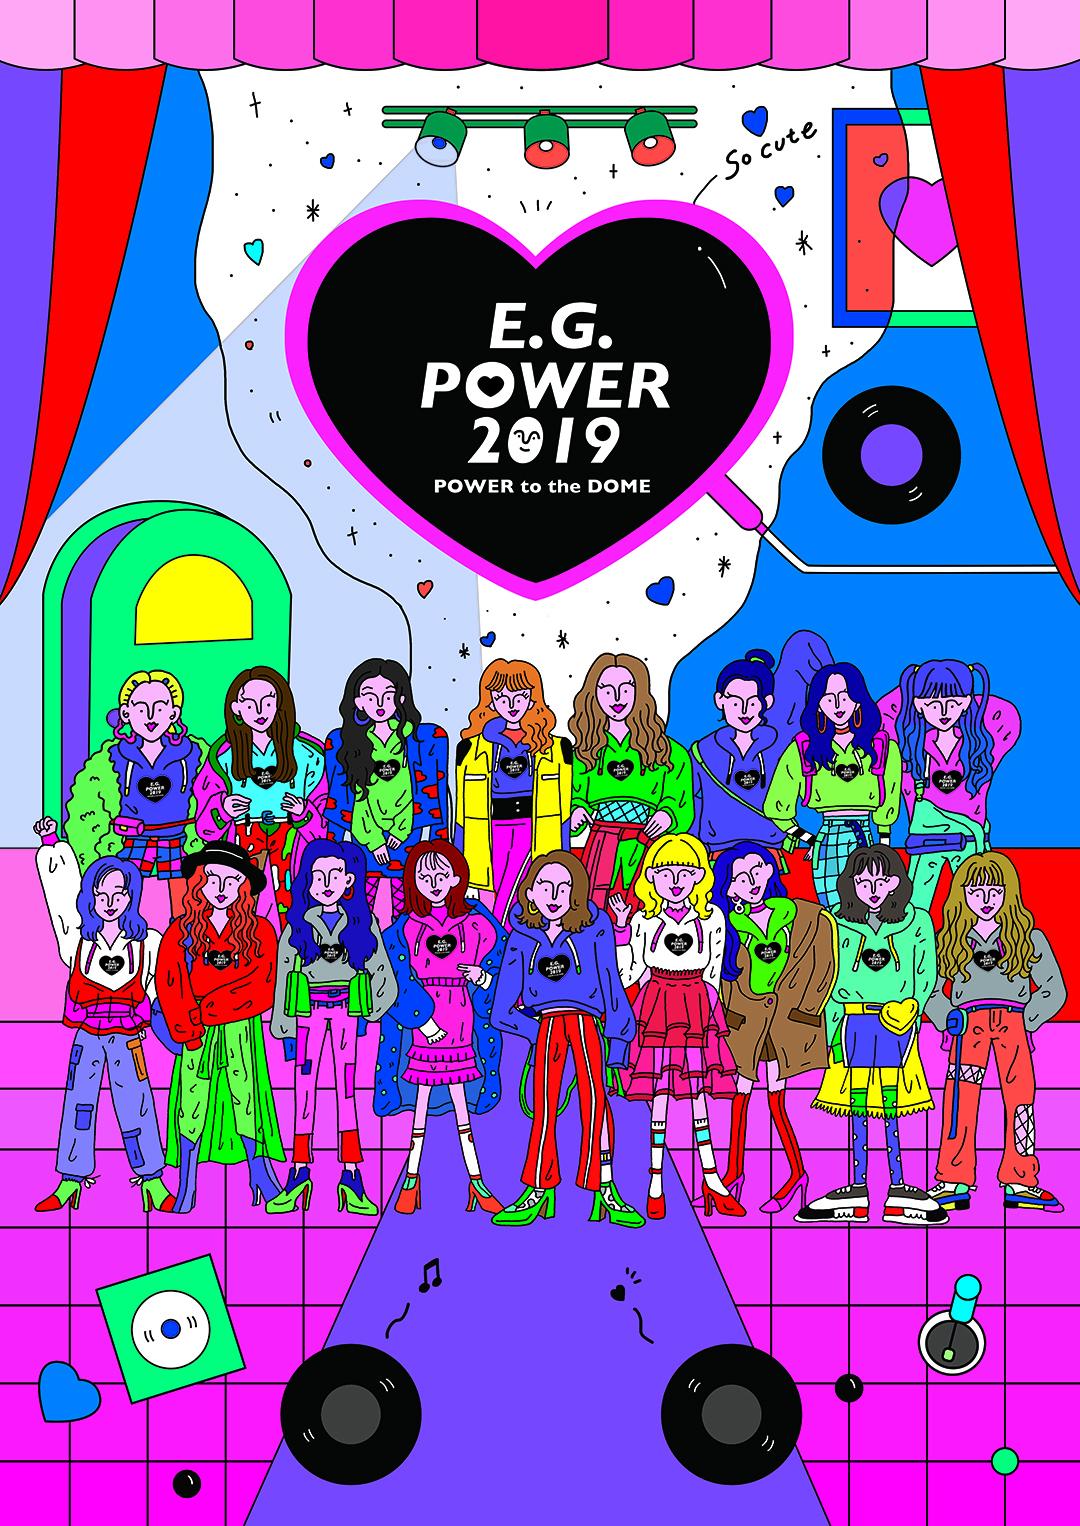 GirlsclubAsia-Artist-REDFISH-egpower